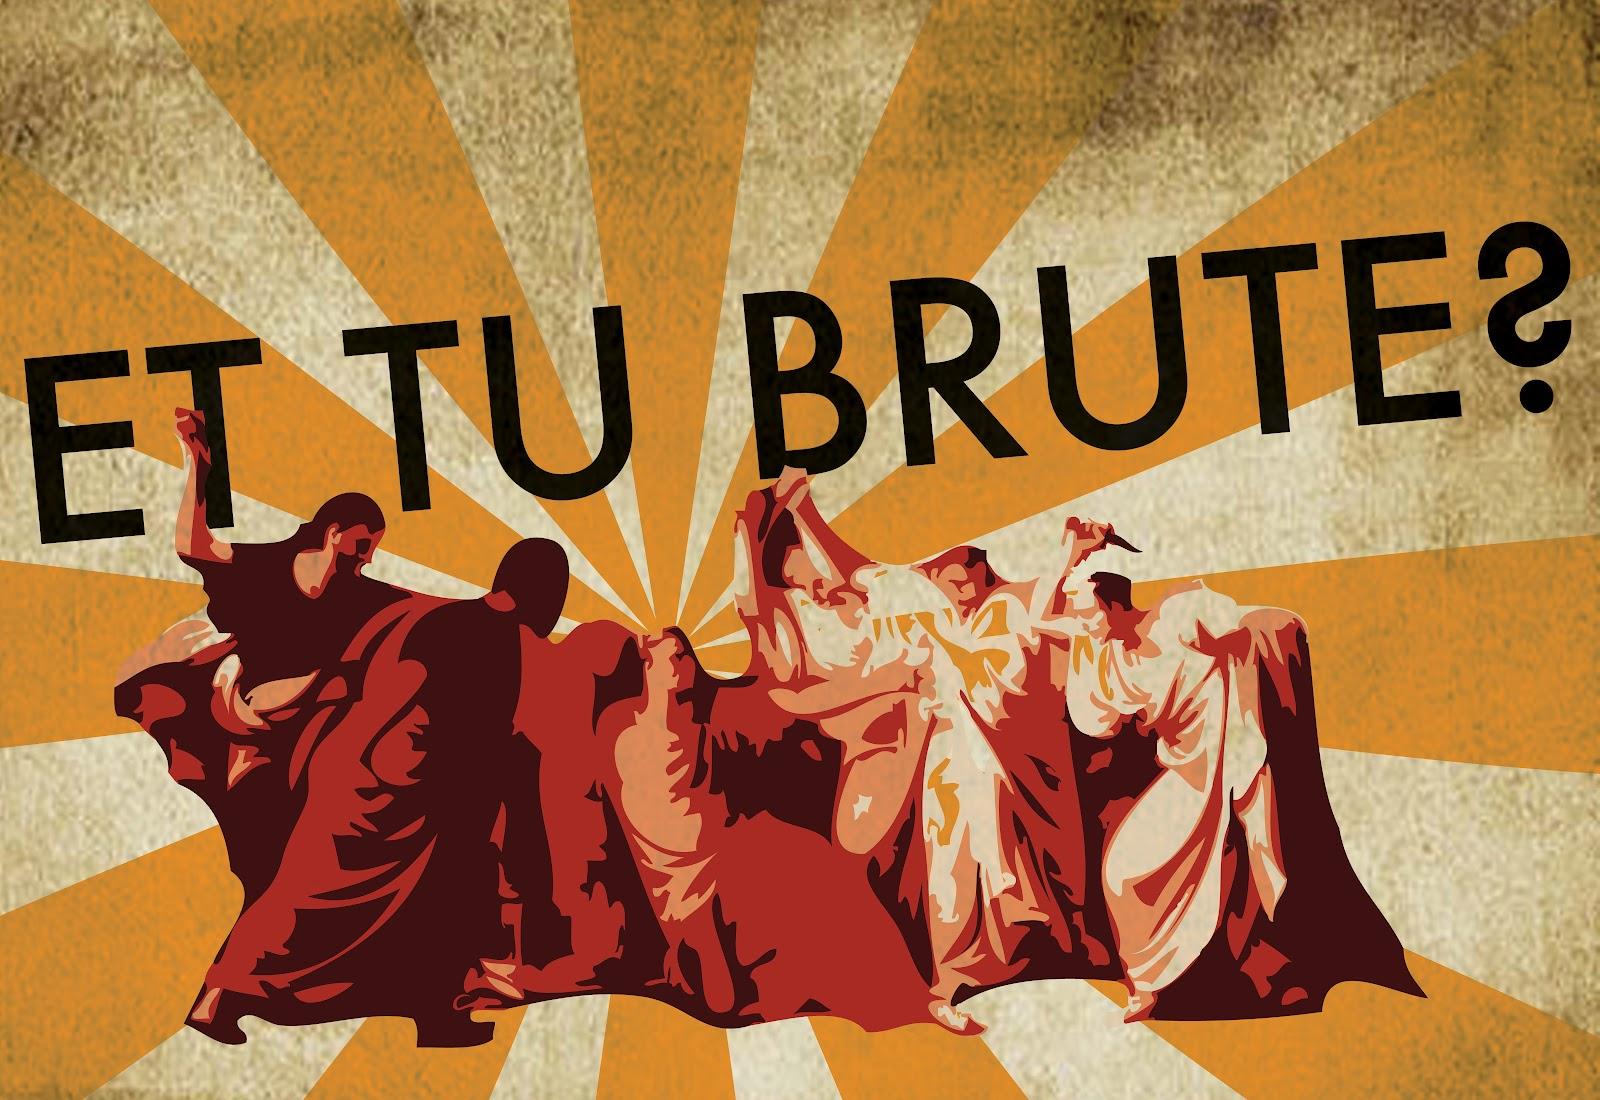 the role of marcus brutus in the assassination of julius caesar Octavius caesar: one of the triumvirs who rule following the death of julius  caesar,  and powerful senator, marcus brutus is a close friend of julius caesar.